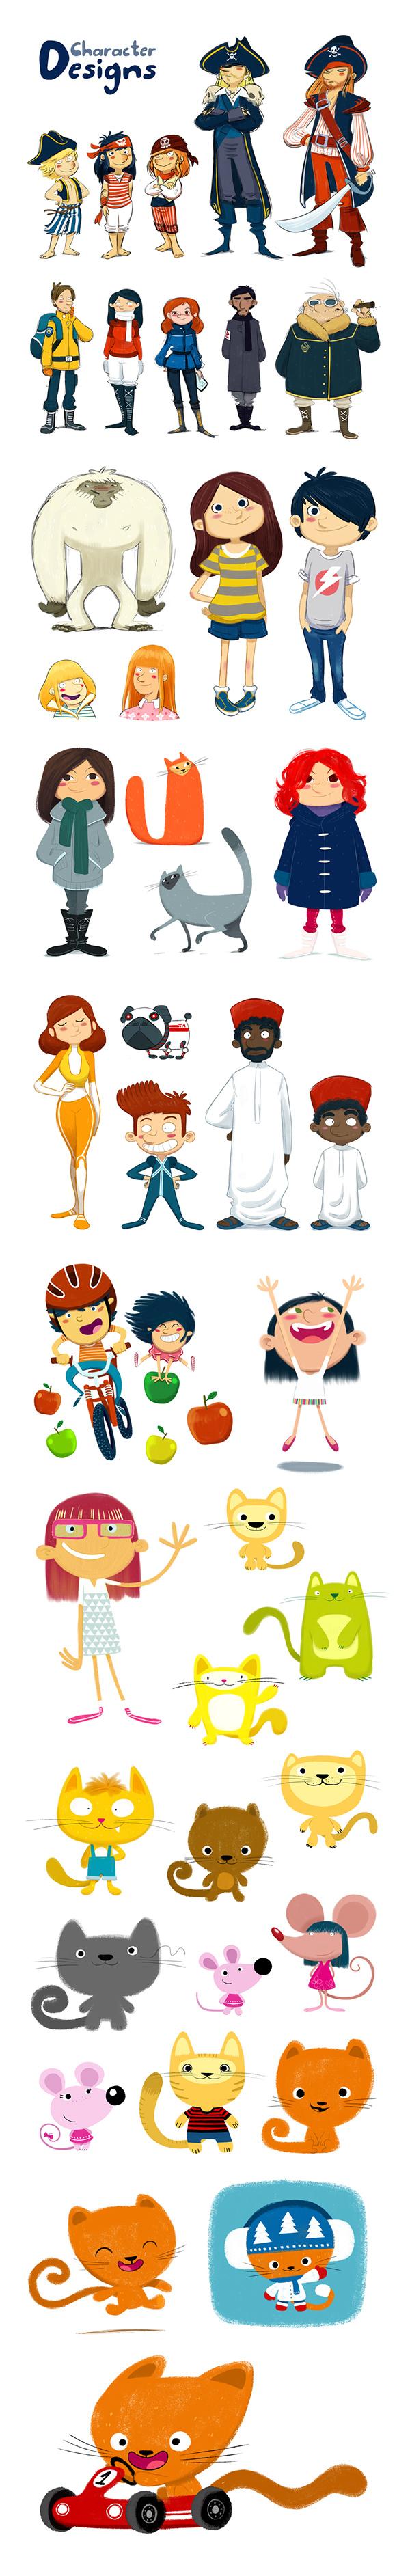 Character Design For Children S Books : Character designs on behance